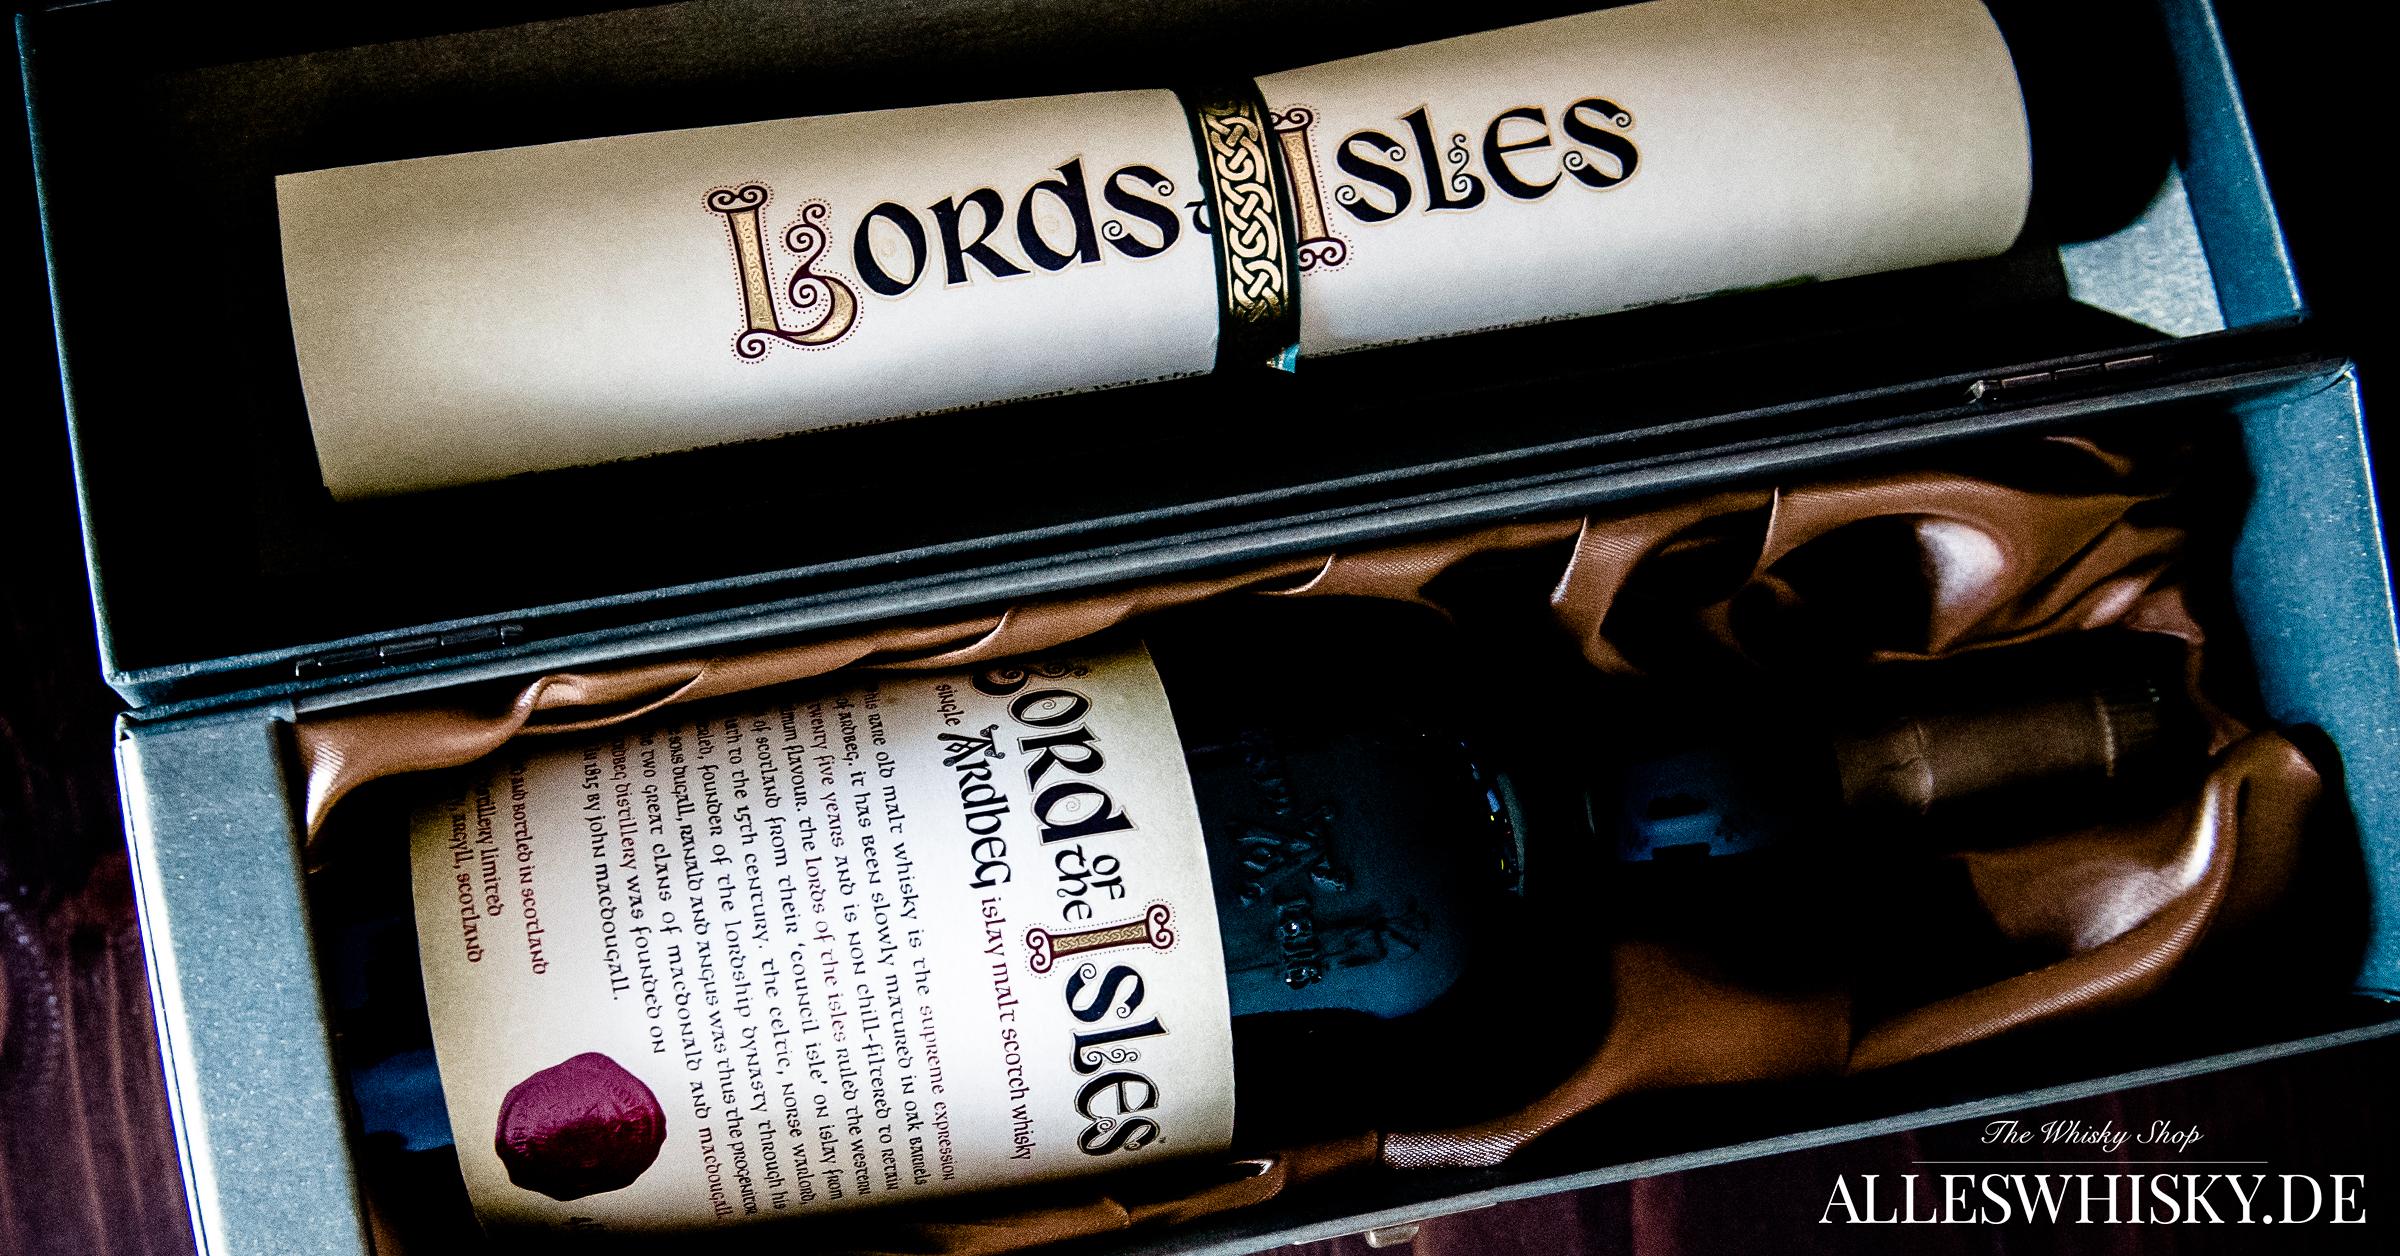 Ardbeg - Lord of the Isles - in Geschenkverpackung